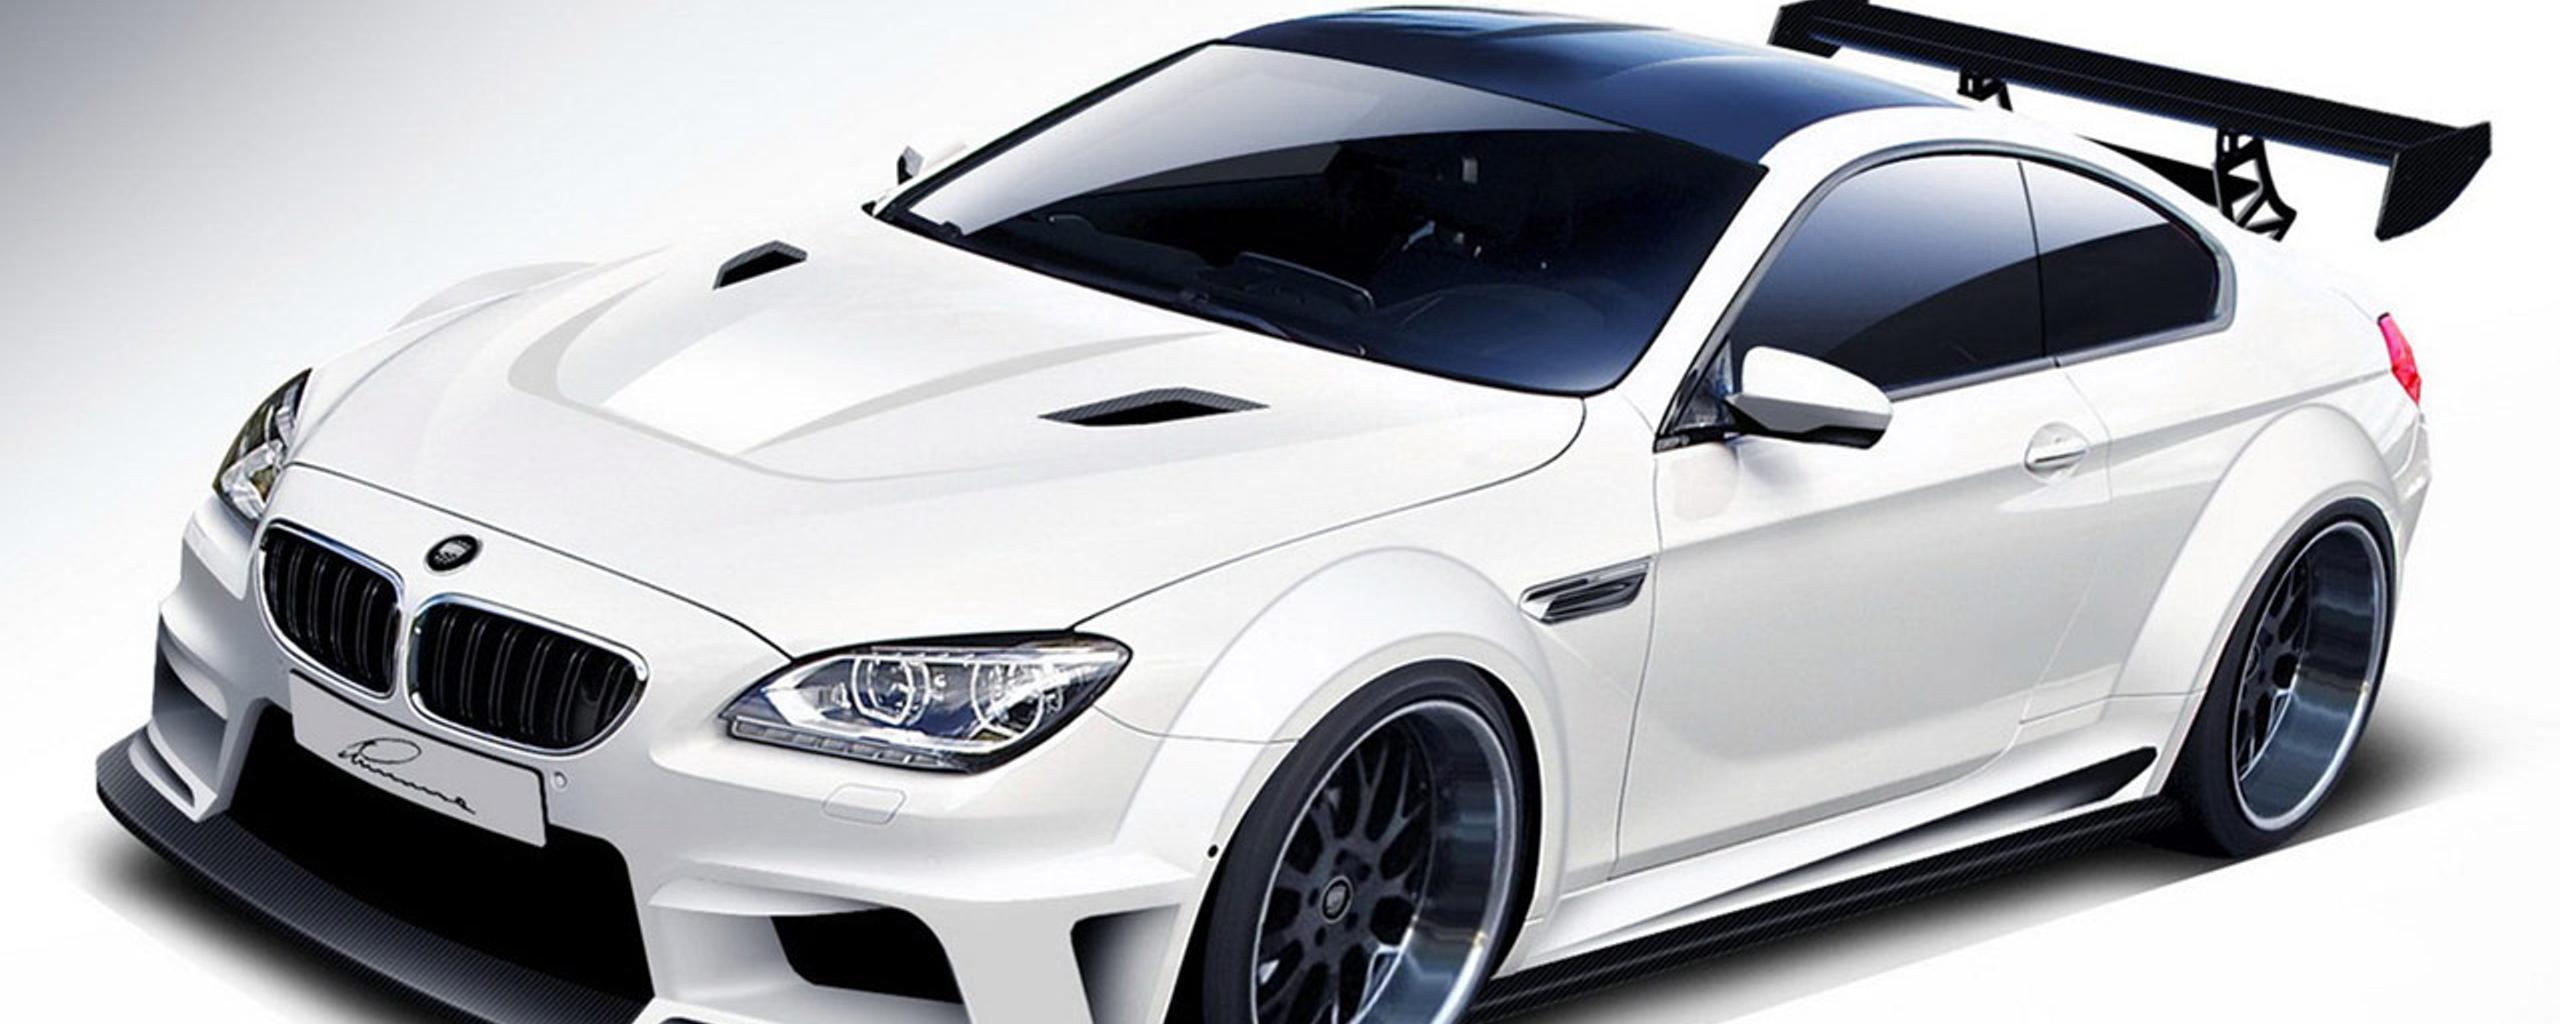 Tuning BMW M6 - White sport car Wallpaper Download 2560x1024